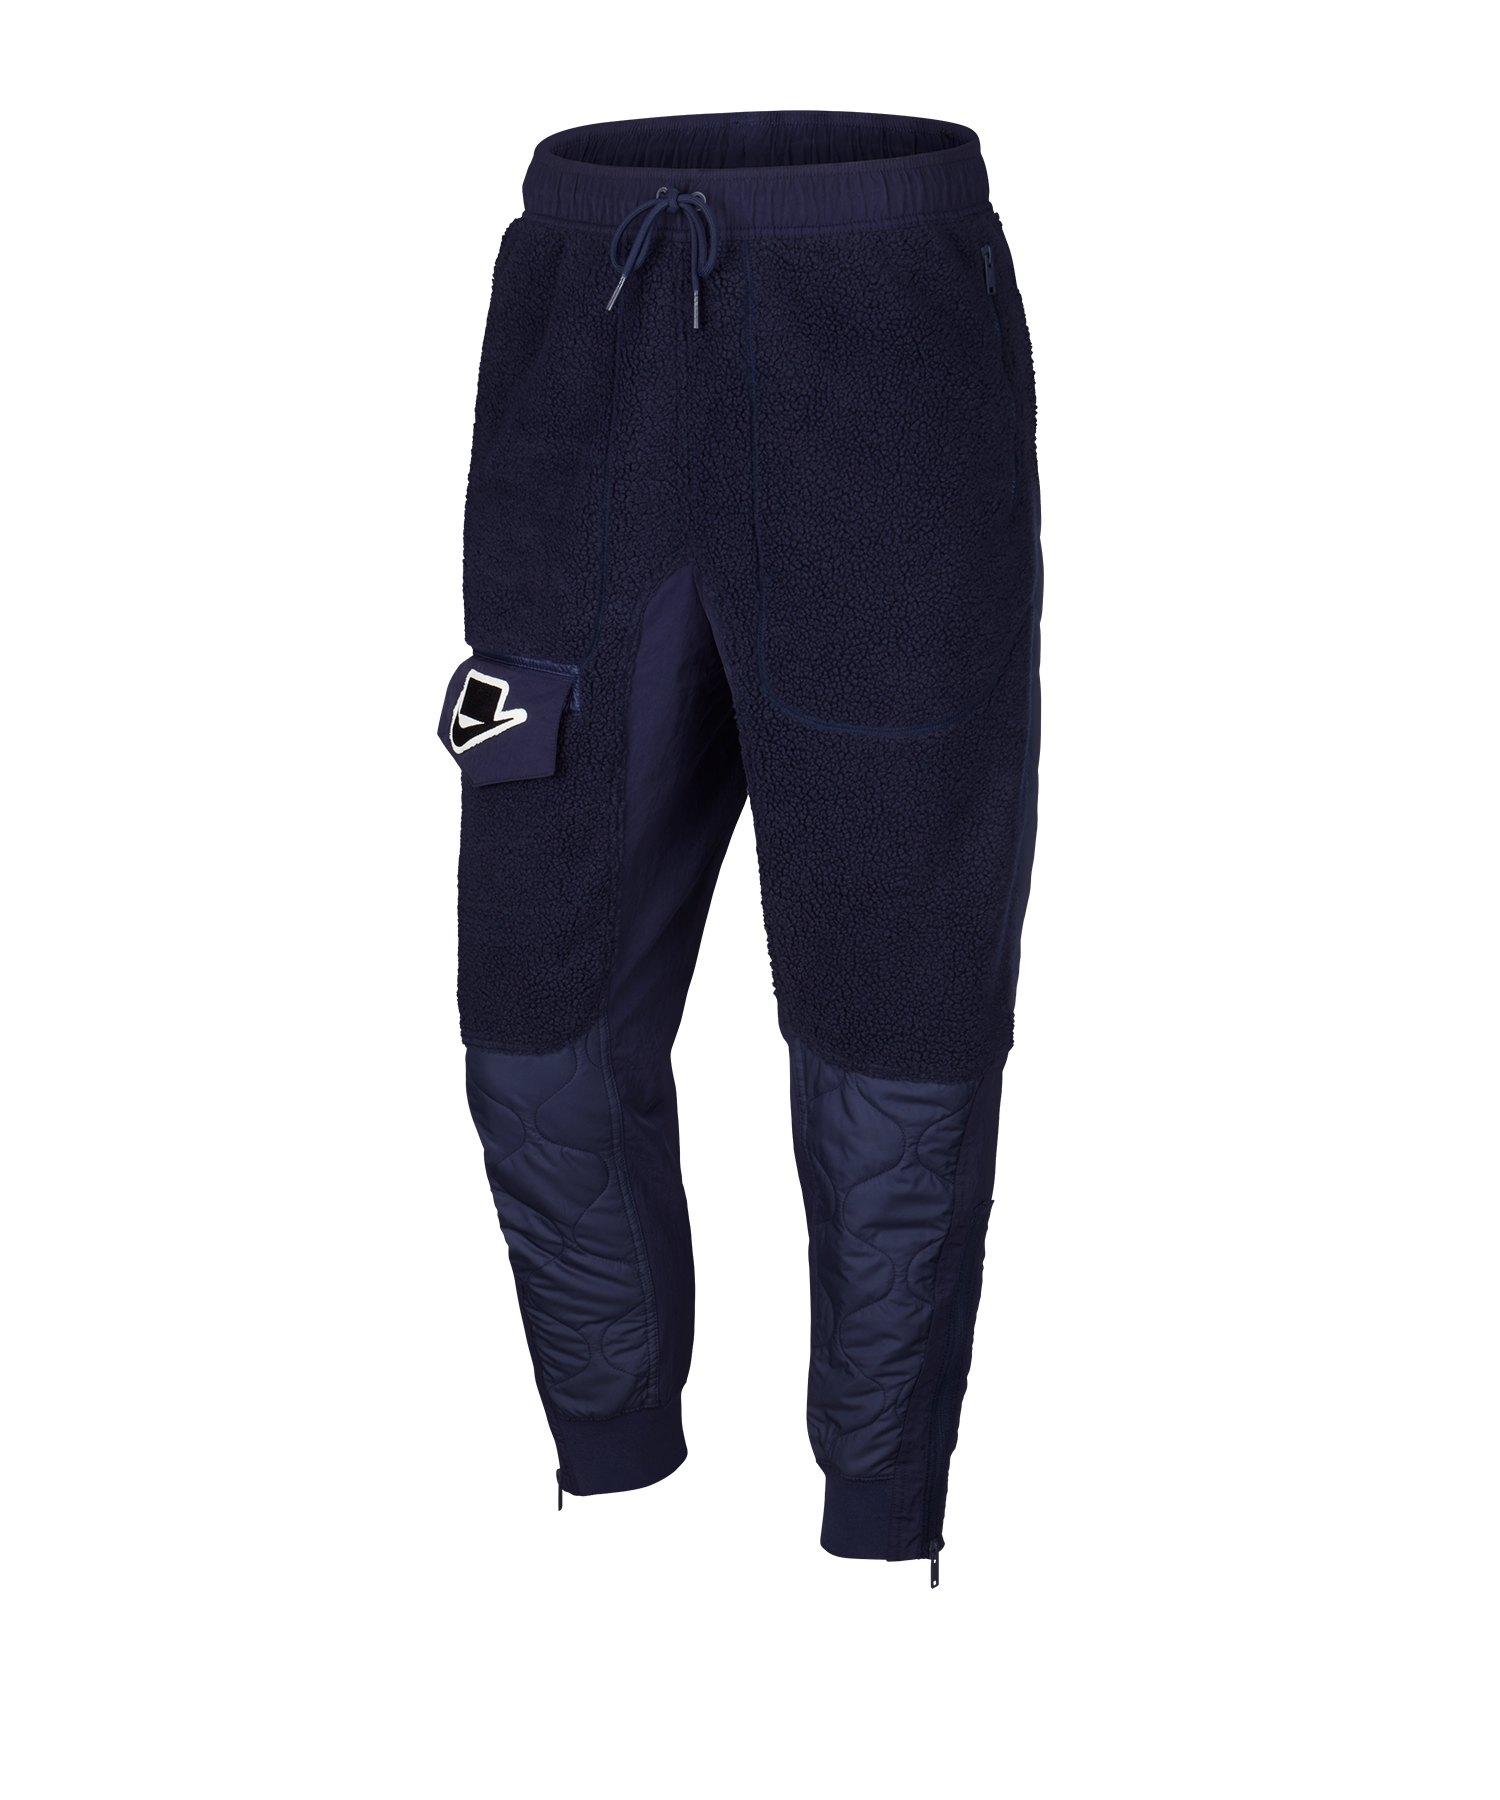 Nike Jogginghose Blau F498 - blau